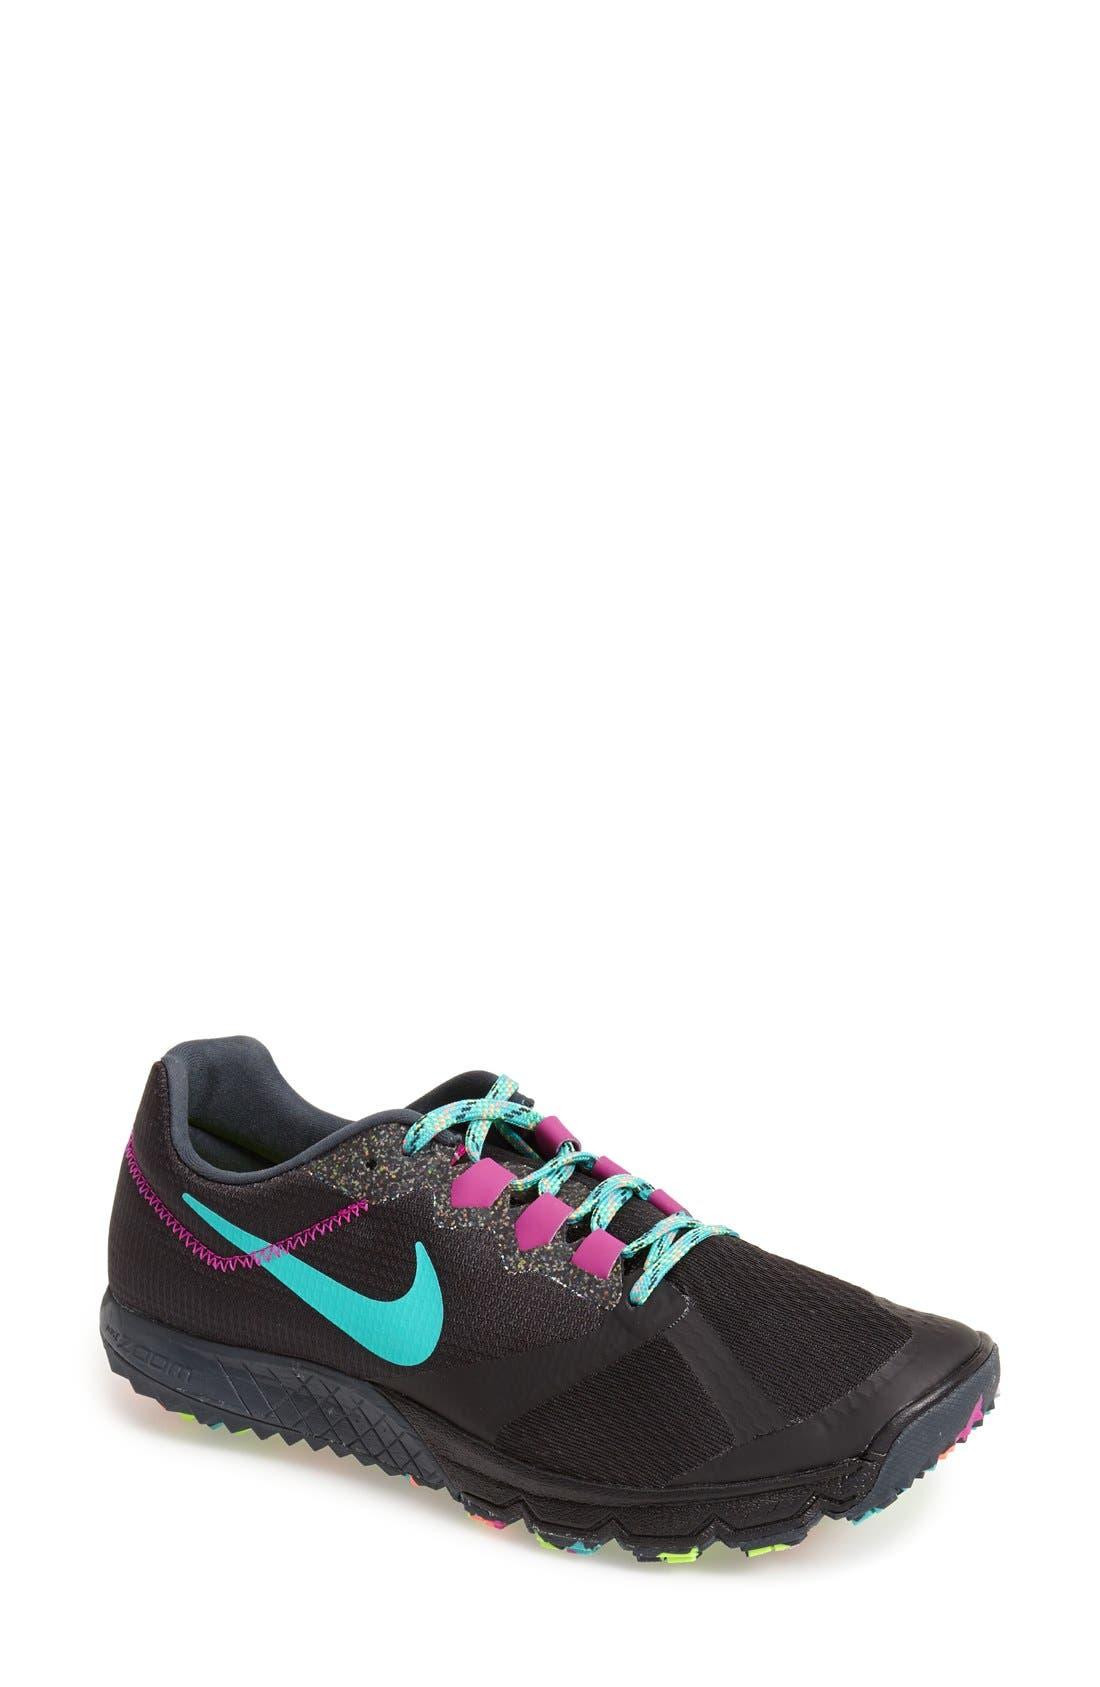 Alternate Image 1 Selected - Nike 'Zoom Wildhorse 2' Running Shoe (Women)